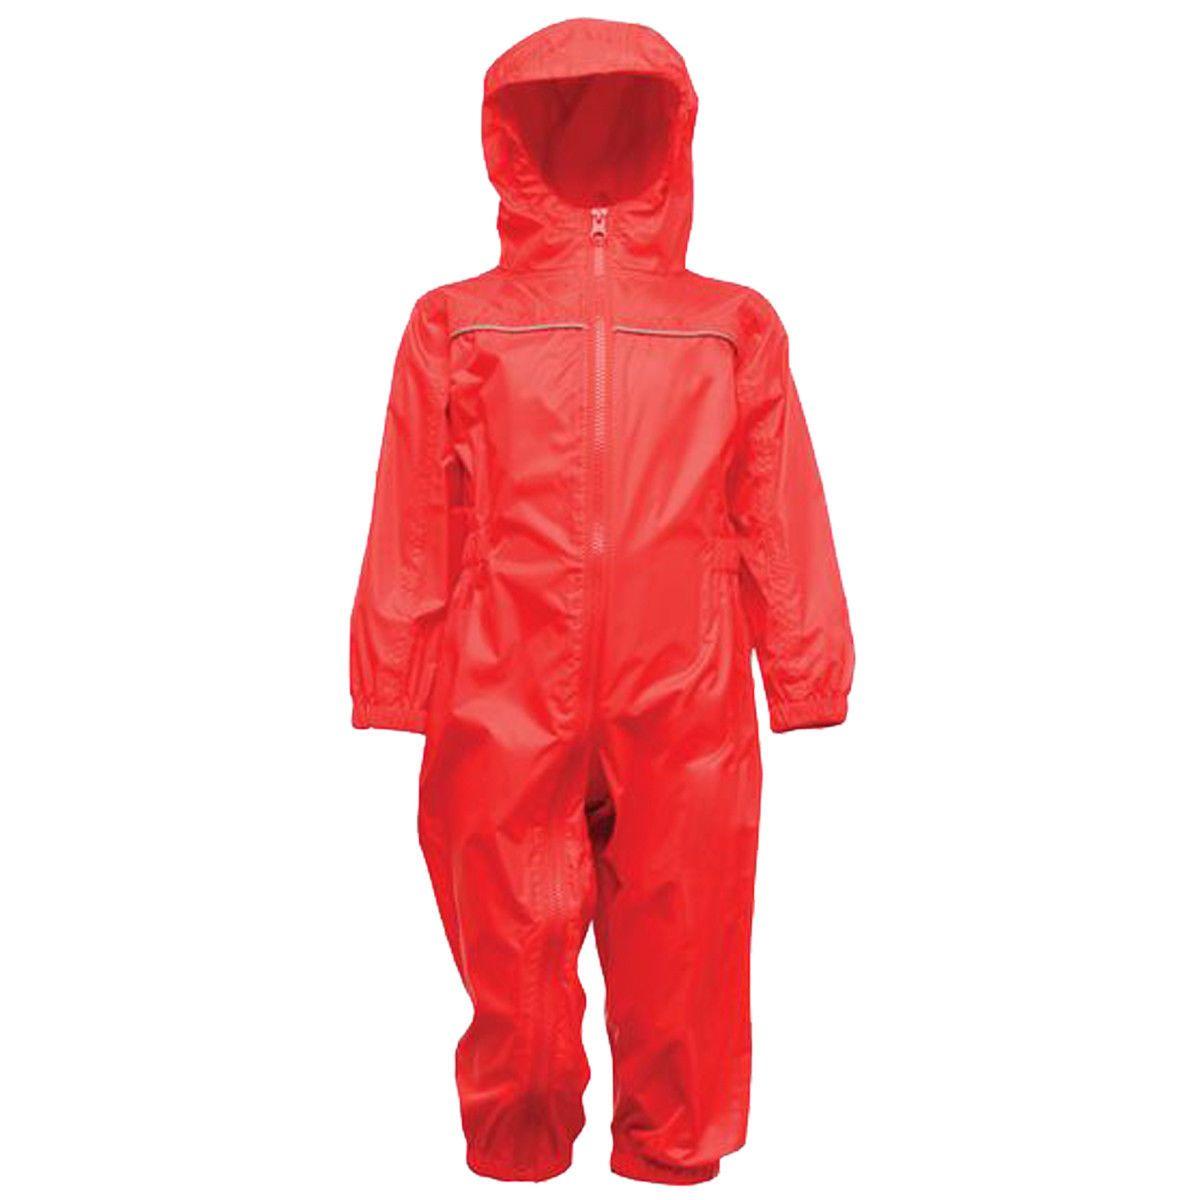 Regatta Kid's Breathable Rain Suit Various Colours L_TRW466 - Classic Red 6 to 12 Months